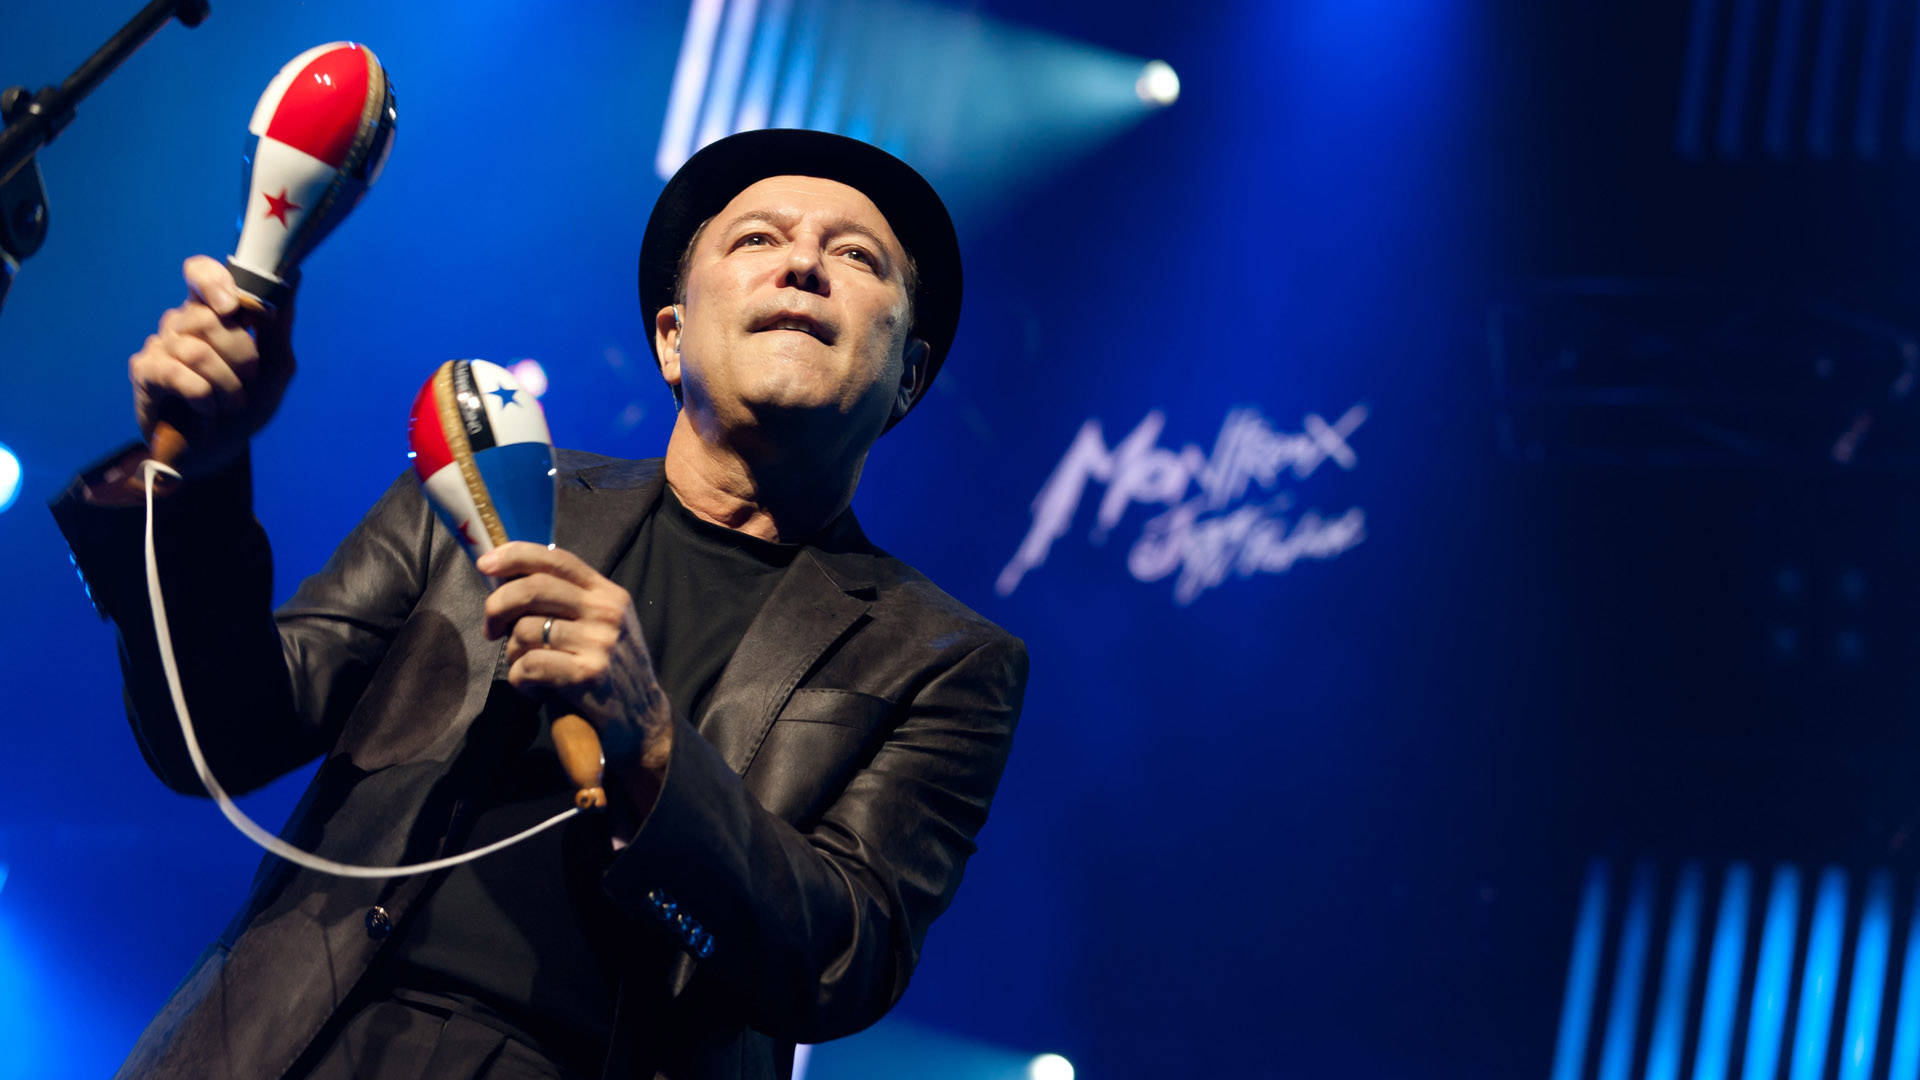 Rubén Blades performing at the Montreux Jazz Festival, from 'Yo No Me Llamo Rubén Blades.' Courtesy of Cine+Mas SF